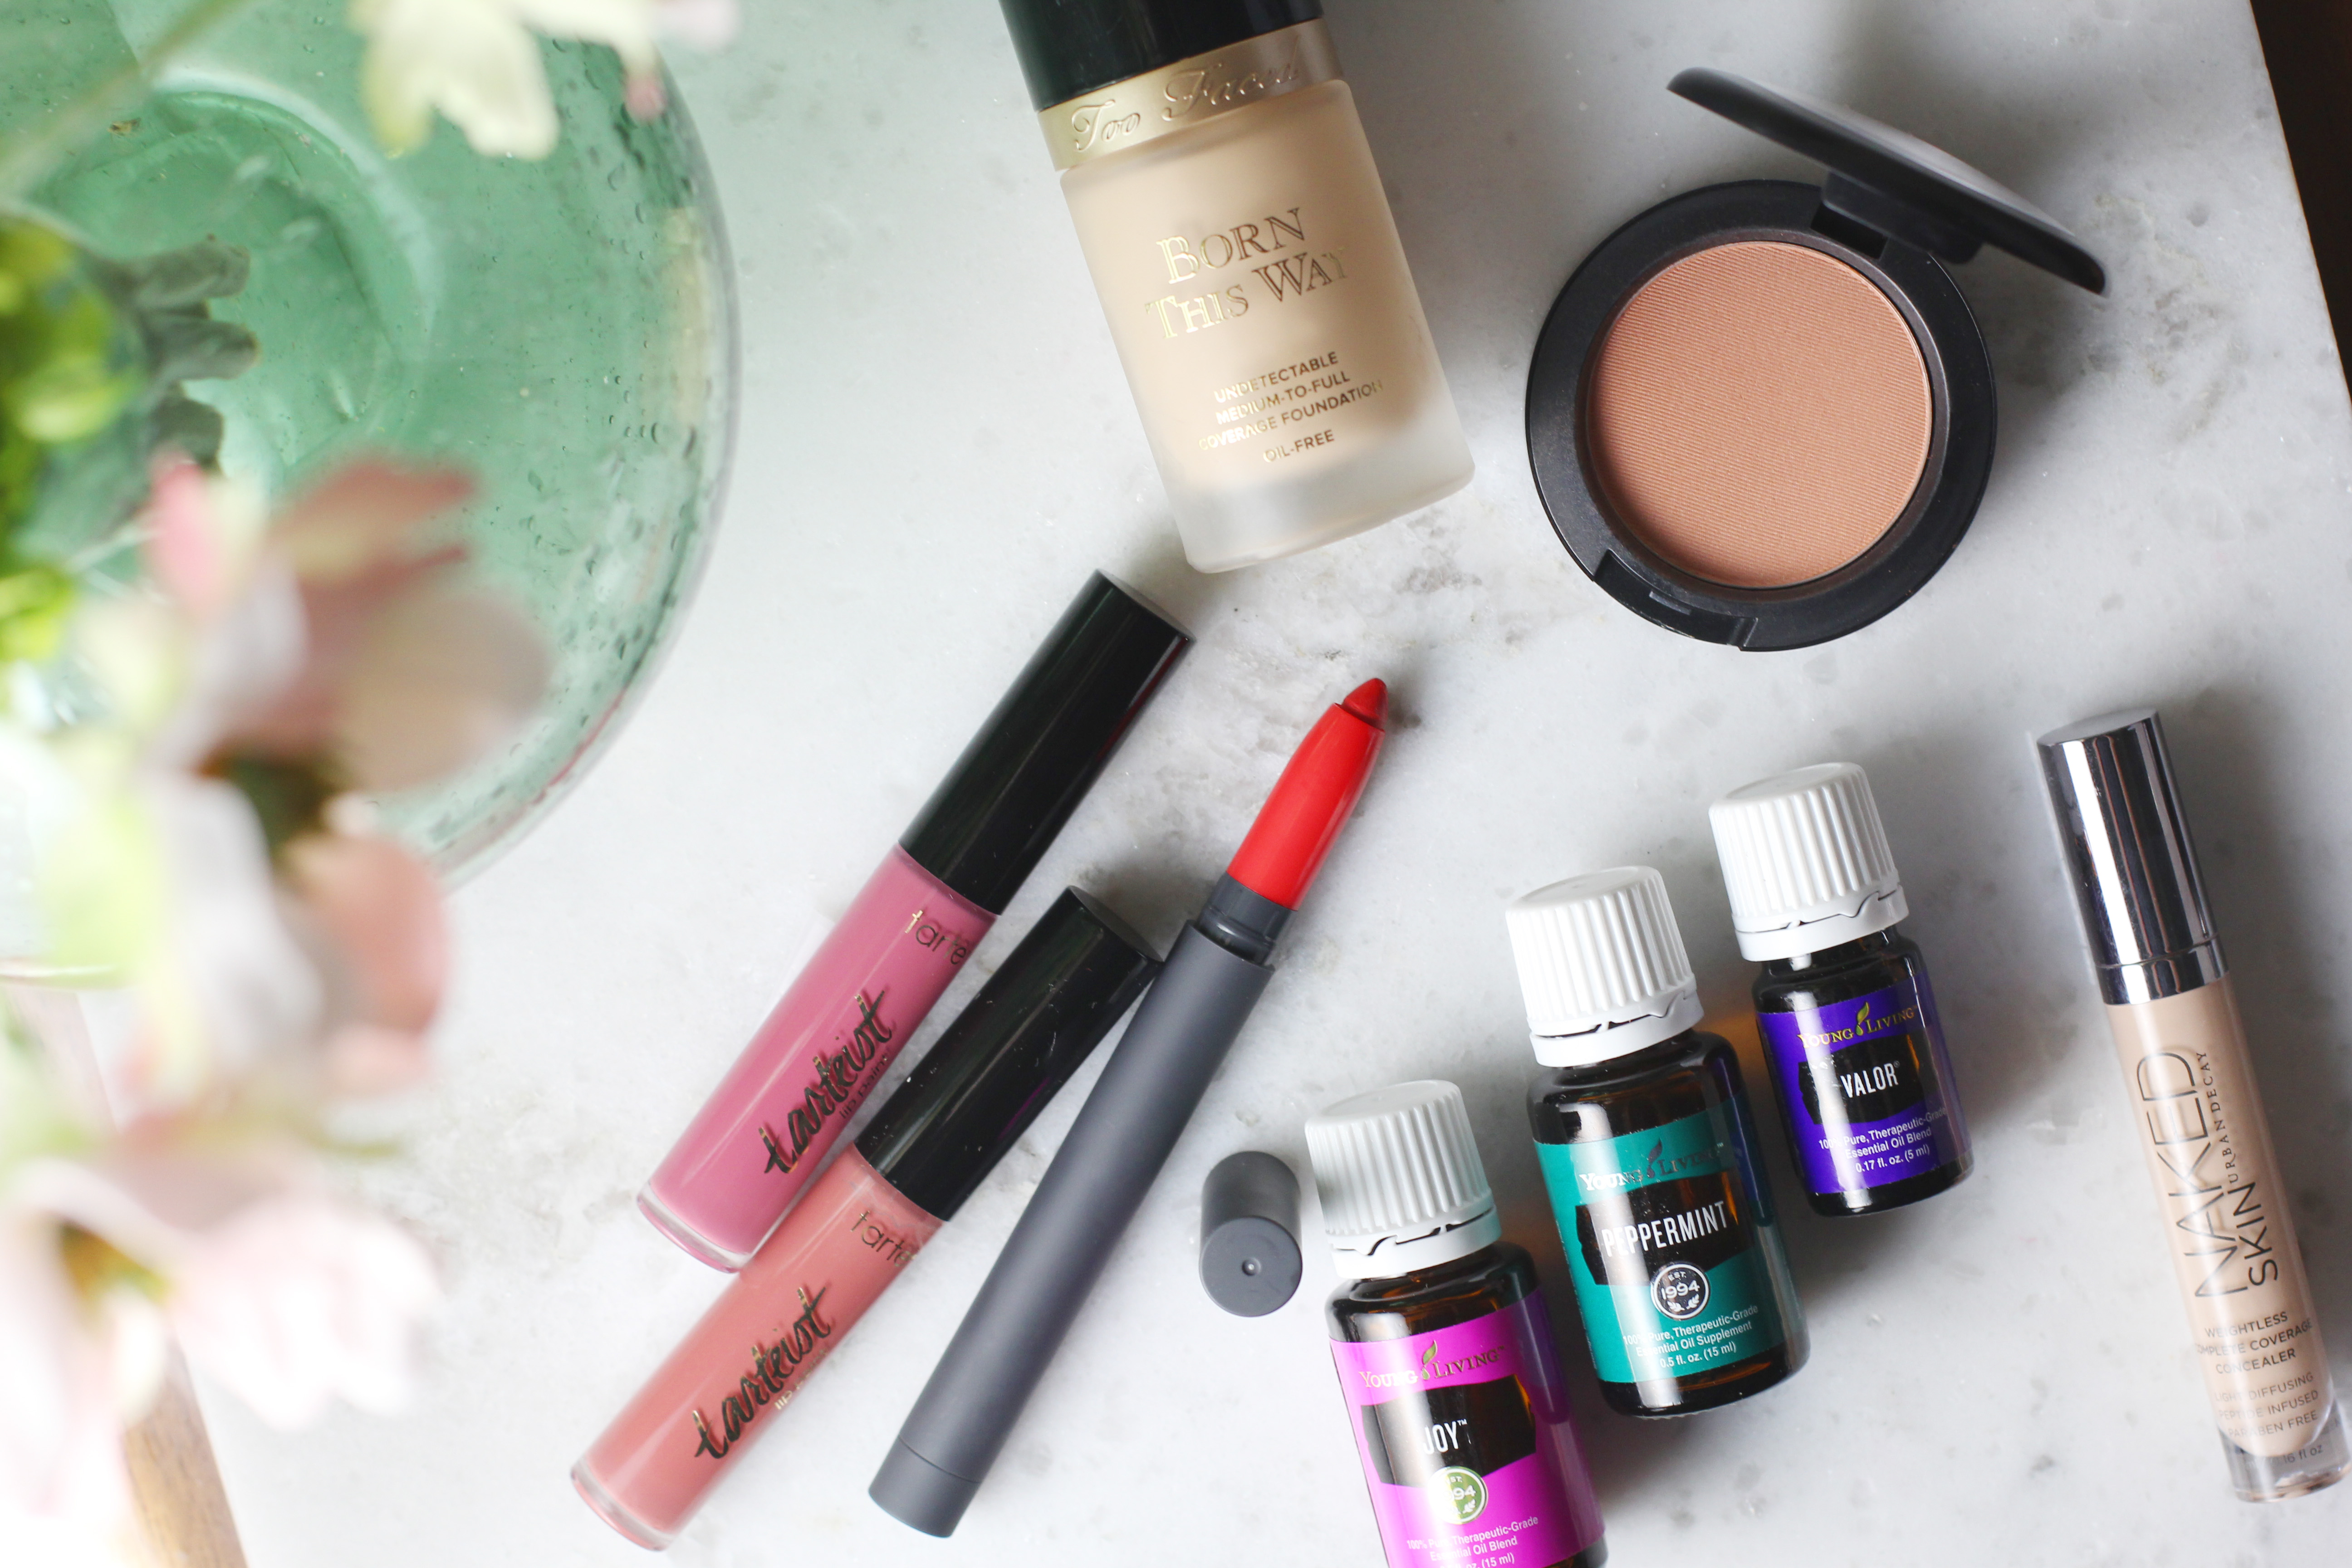 January Beauty Buys 2016